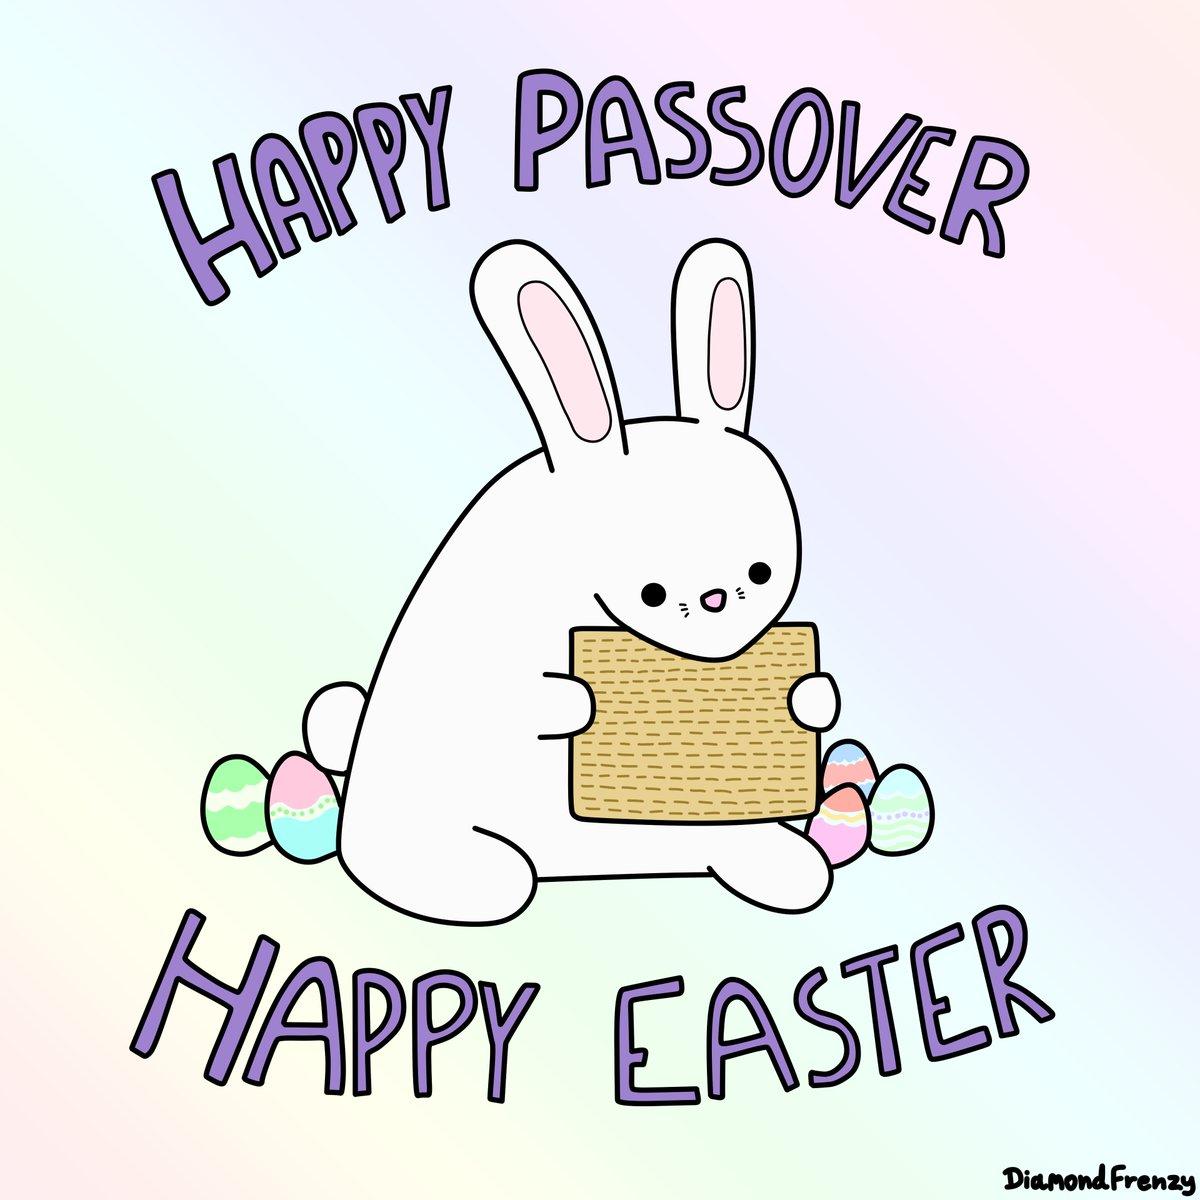 PassoverEaster